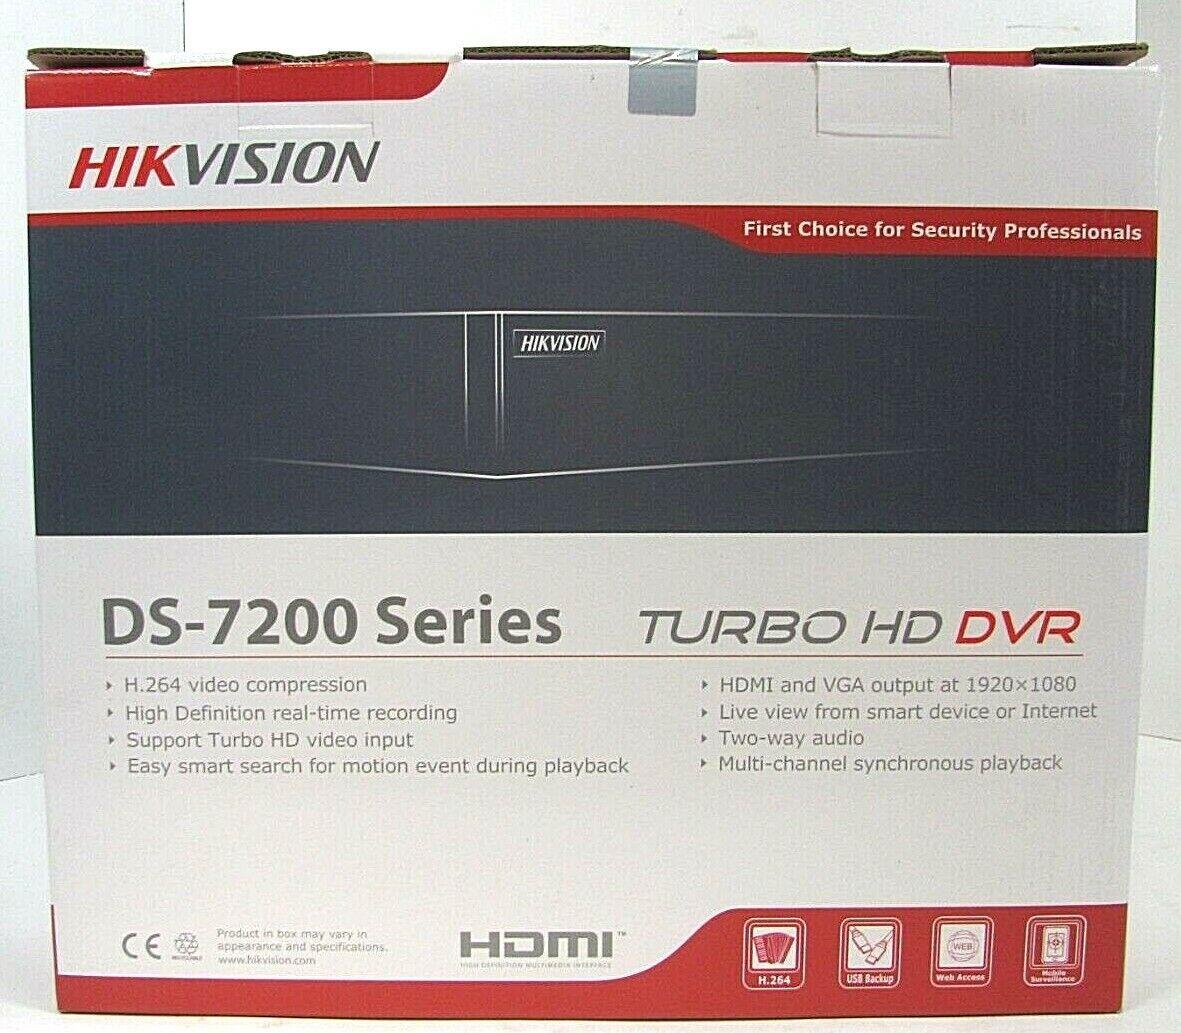 DS-7208HGHI-SH H.264 Hikvision OEM Module WH-D5208 720P REAL-TIME//1080P TRIBRID DVR AUTO-DETECT 8 Channel TURBOHD//Analog